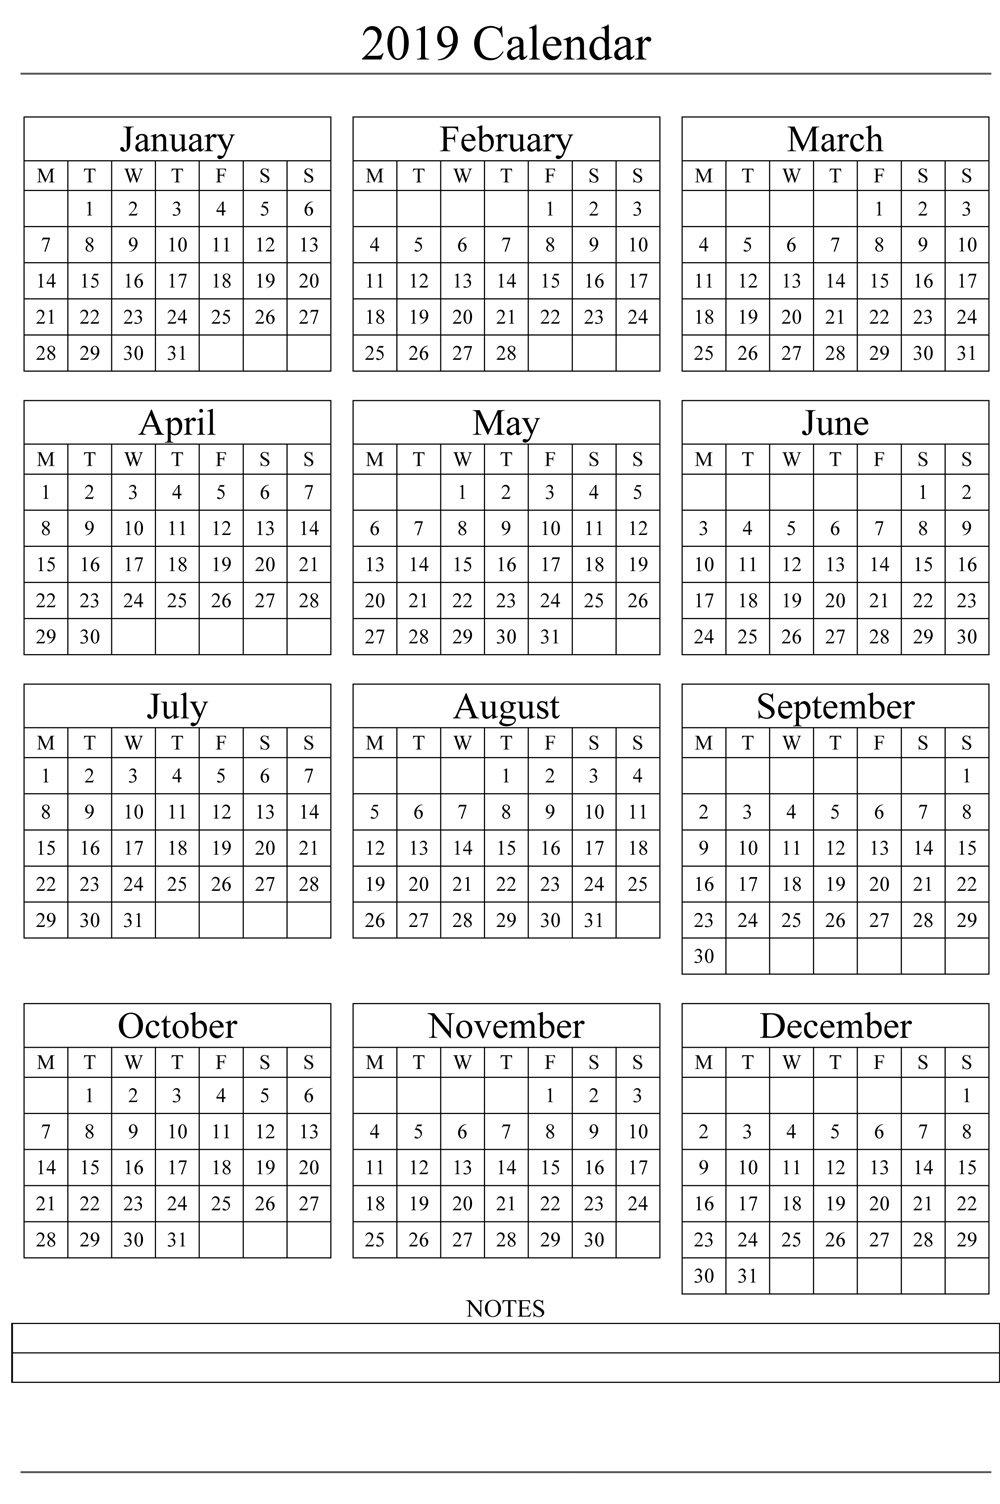 2019 Yearly Calendar Printable Templates – Holidays, Pdf Small Printable Blank Calendar